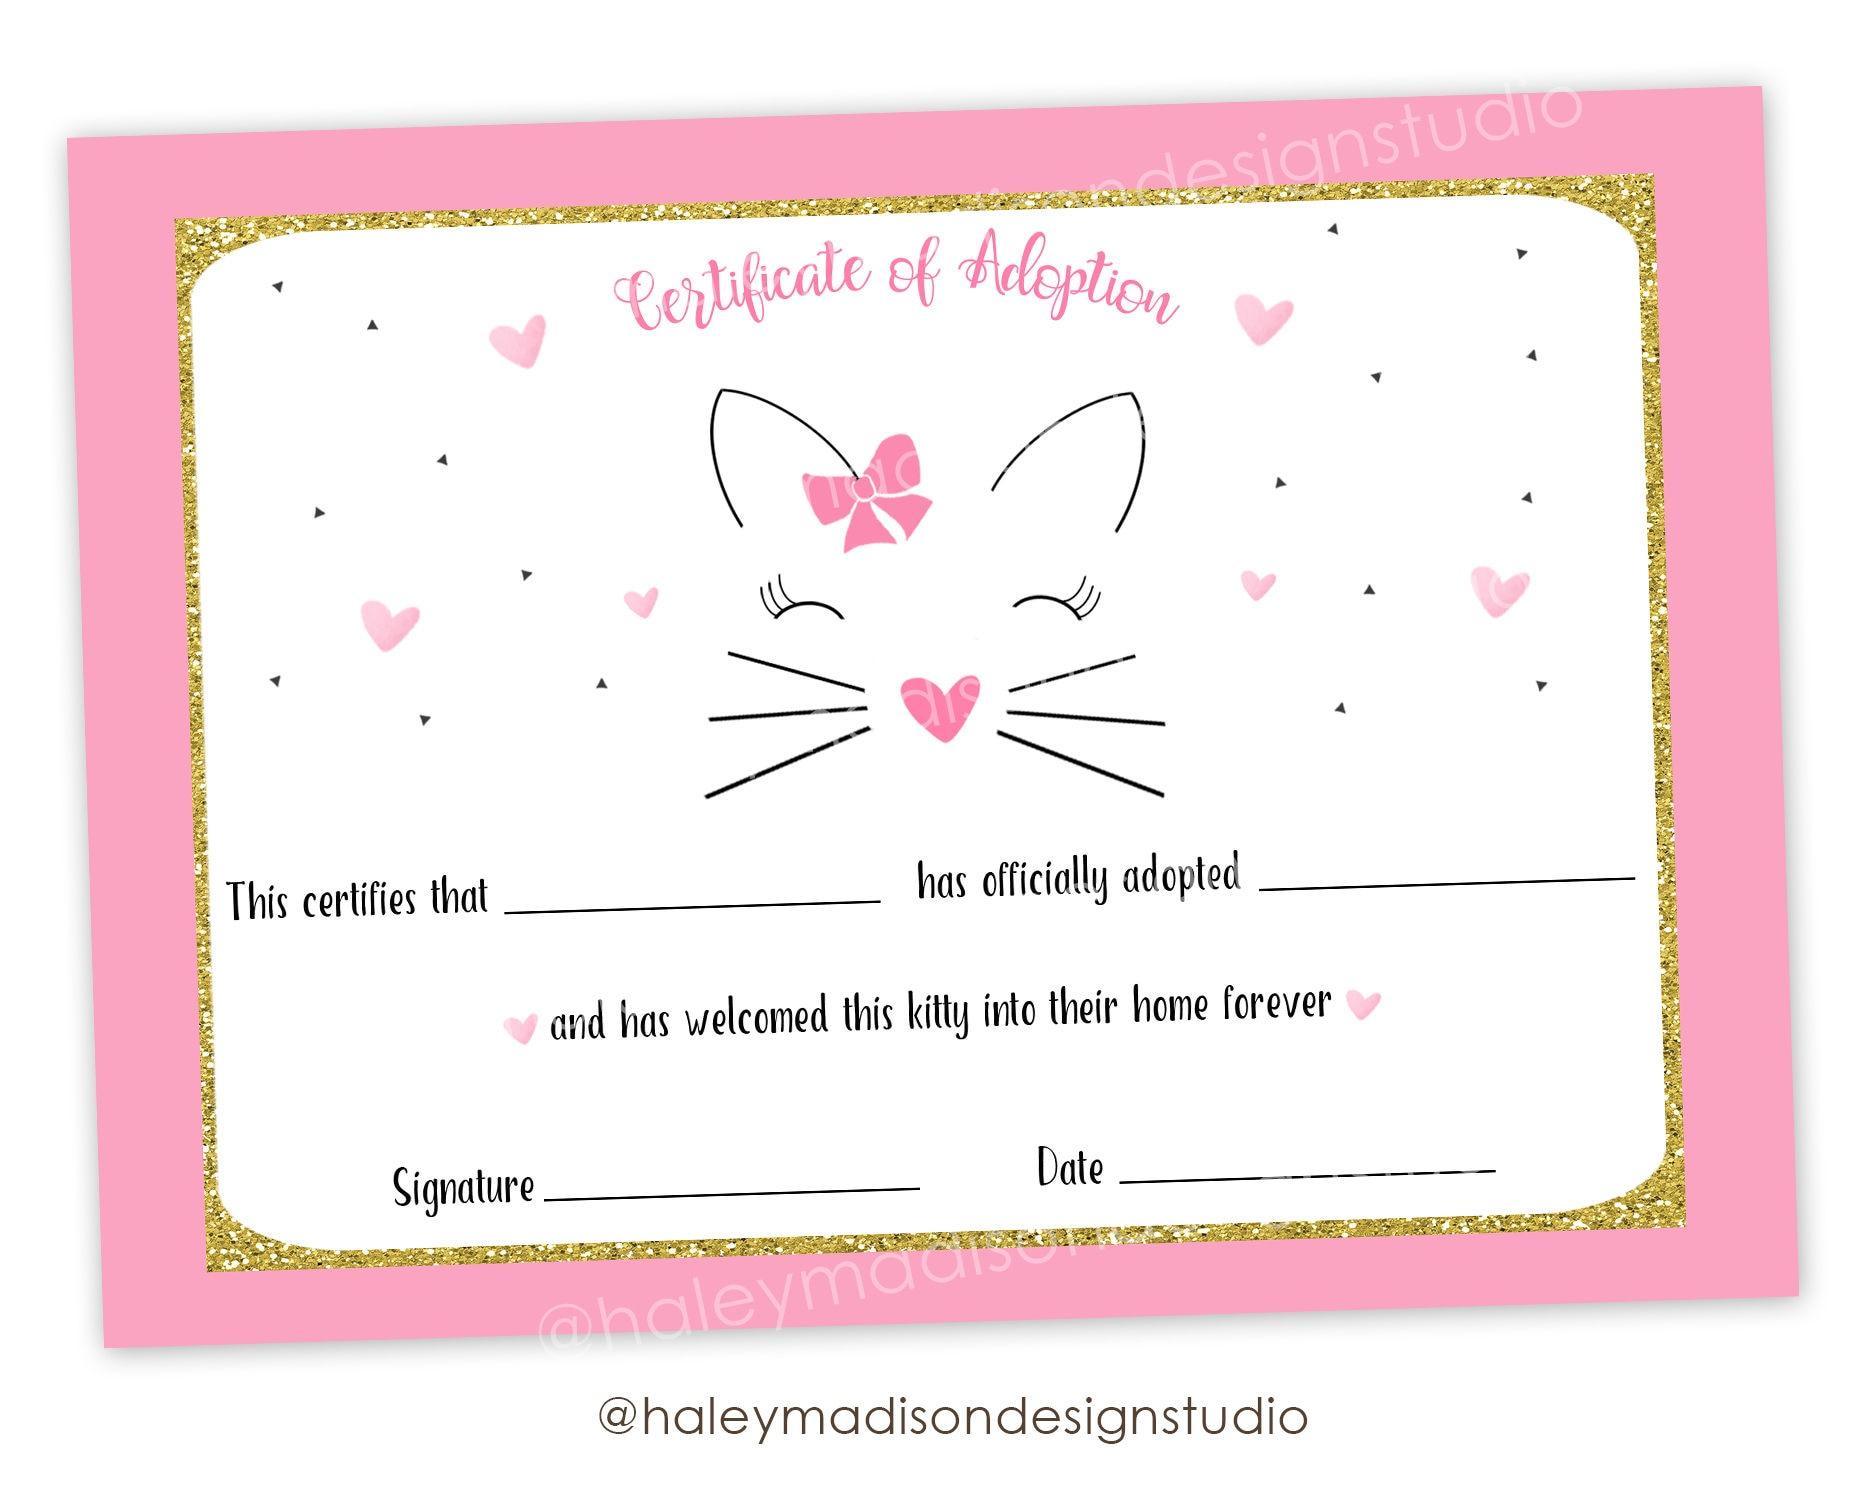 cat adoption certificate  Cat Adoption Certificate Kitty cat adoption cetificate of